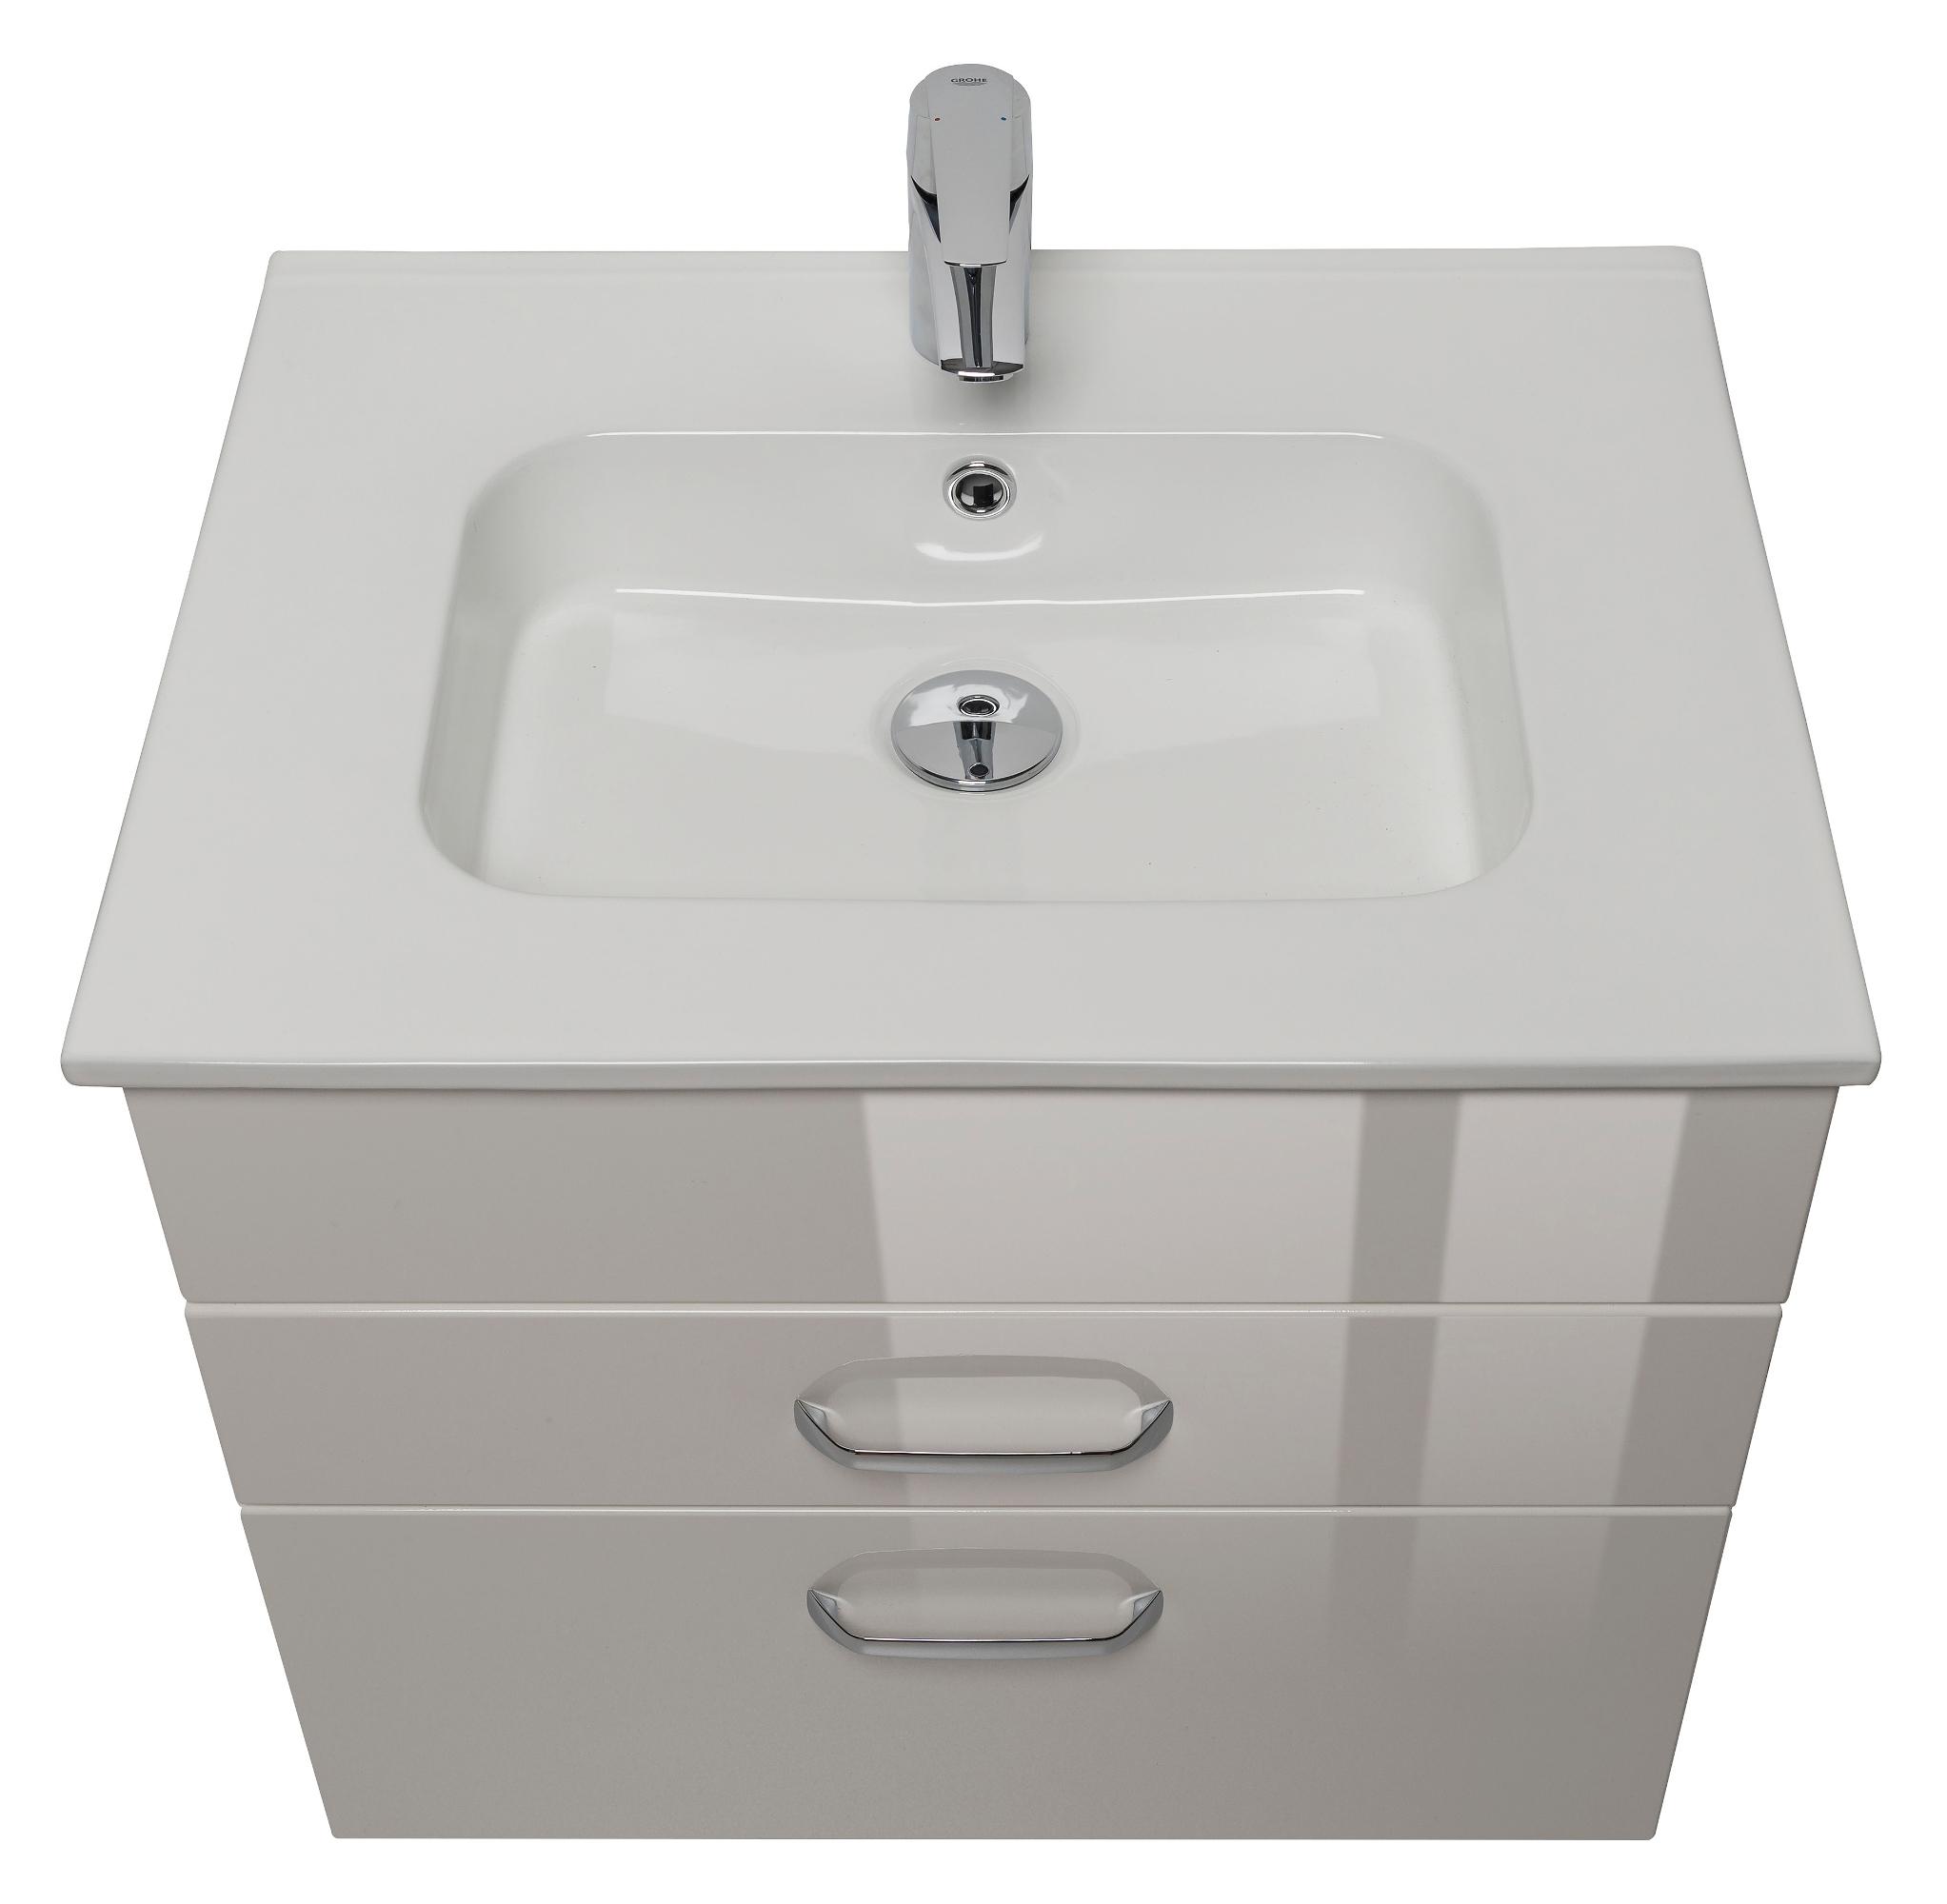 badm bel set fontana mit waschtisch 5 teilig 125 cm breit wei bad badm belsets. Black Bedroom Furniture Sets. Home Design Ideas